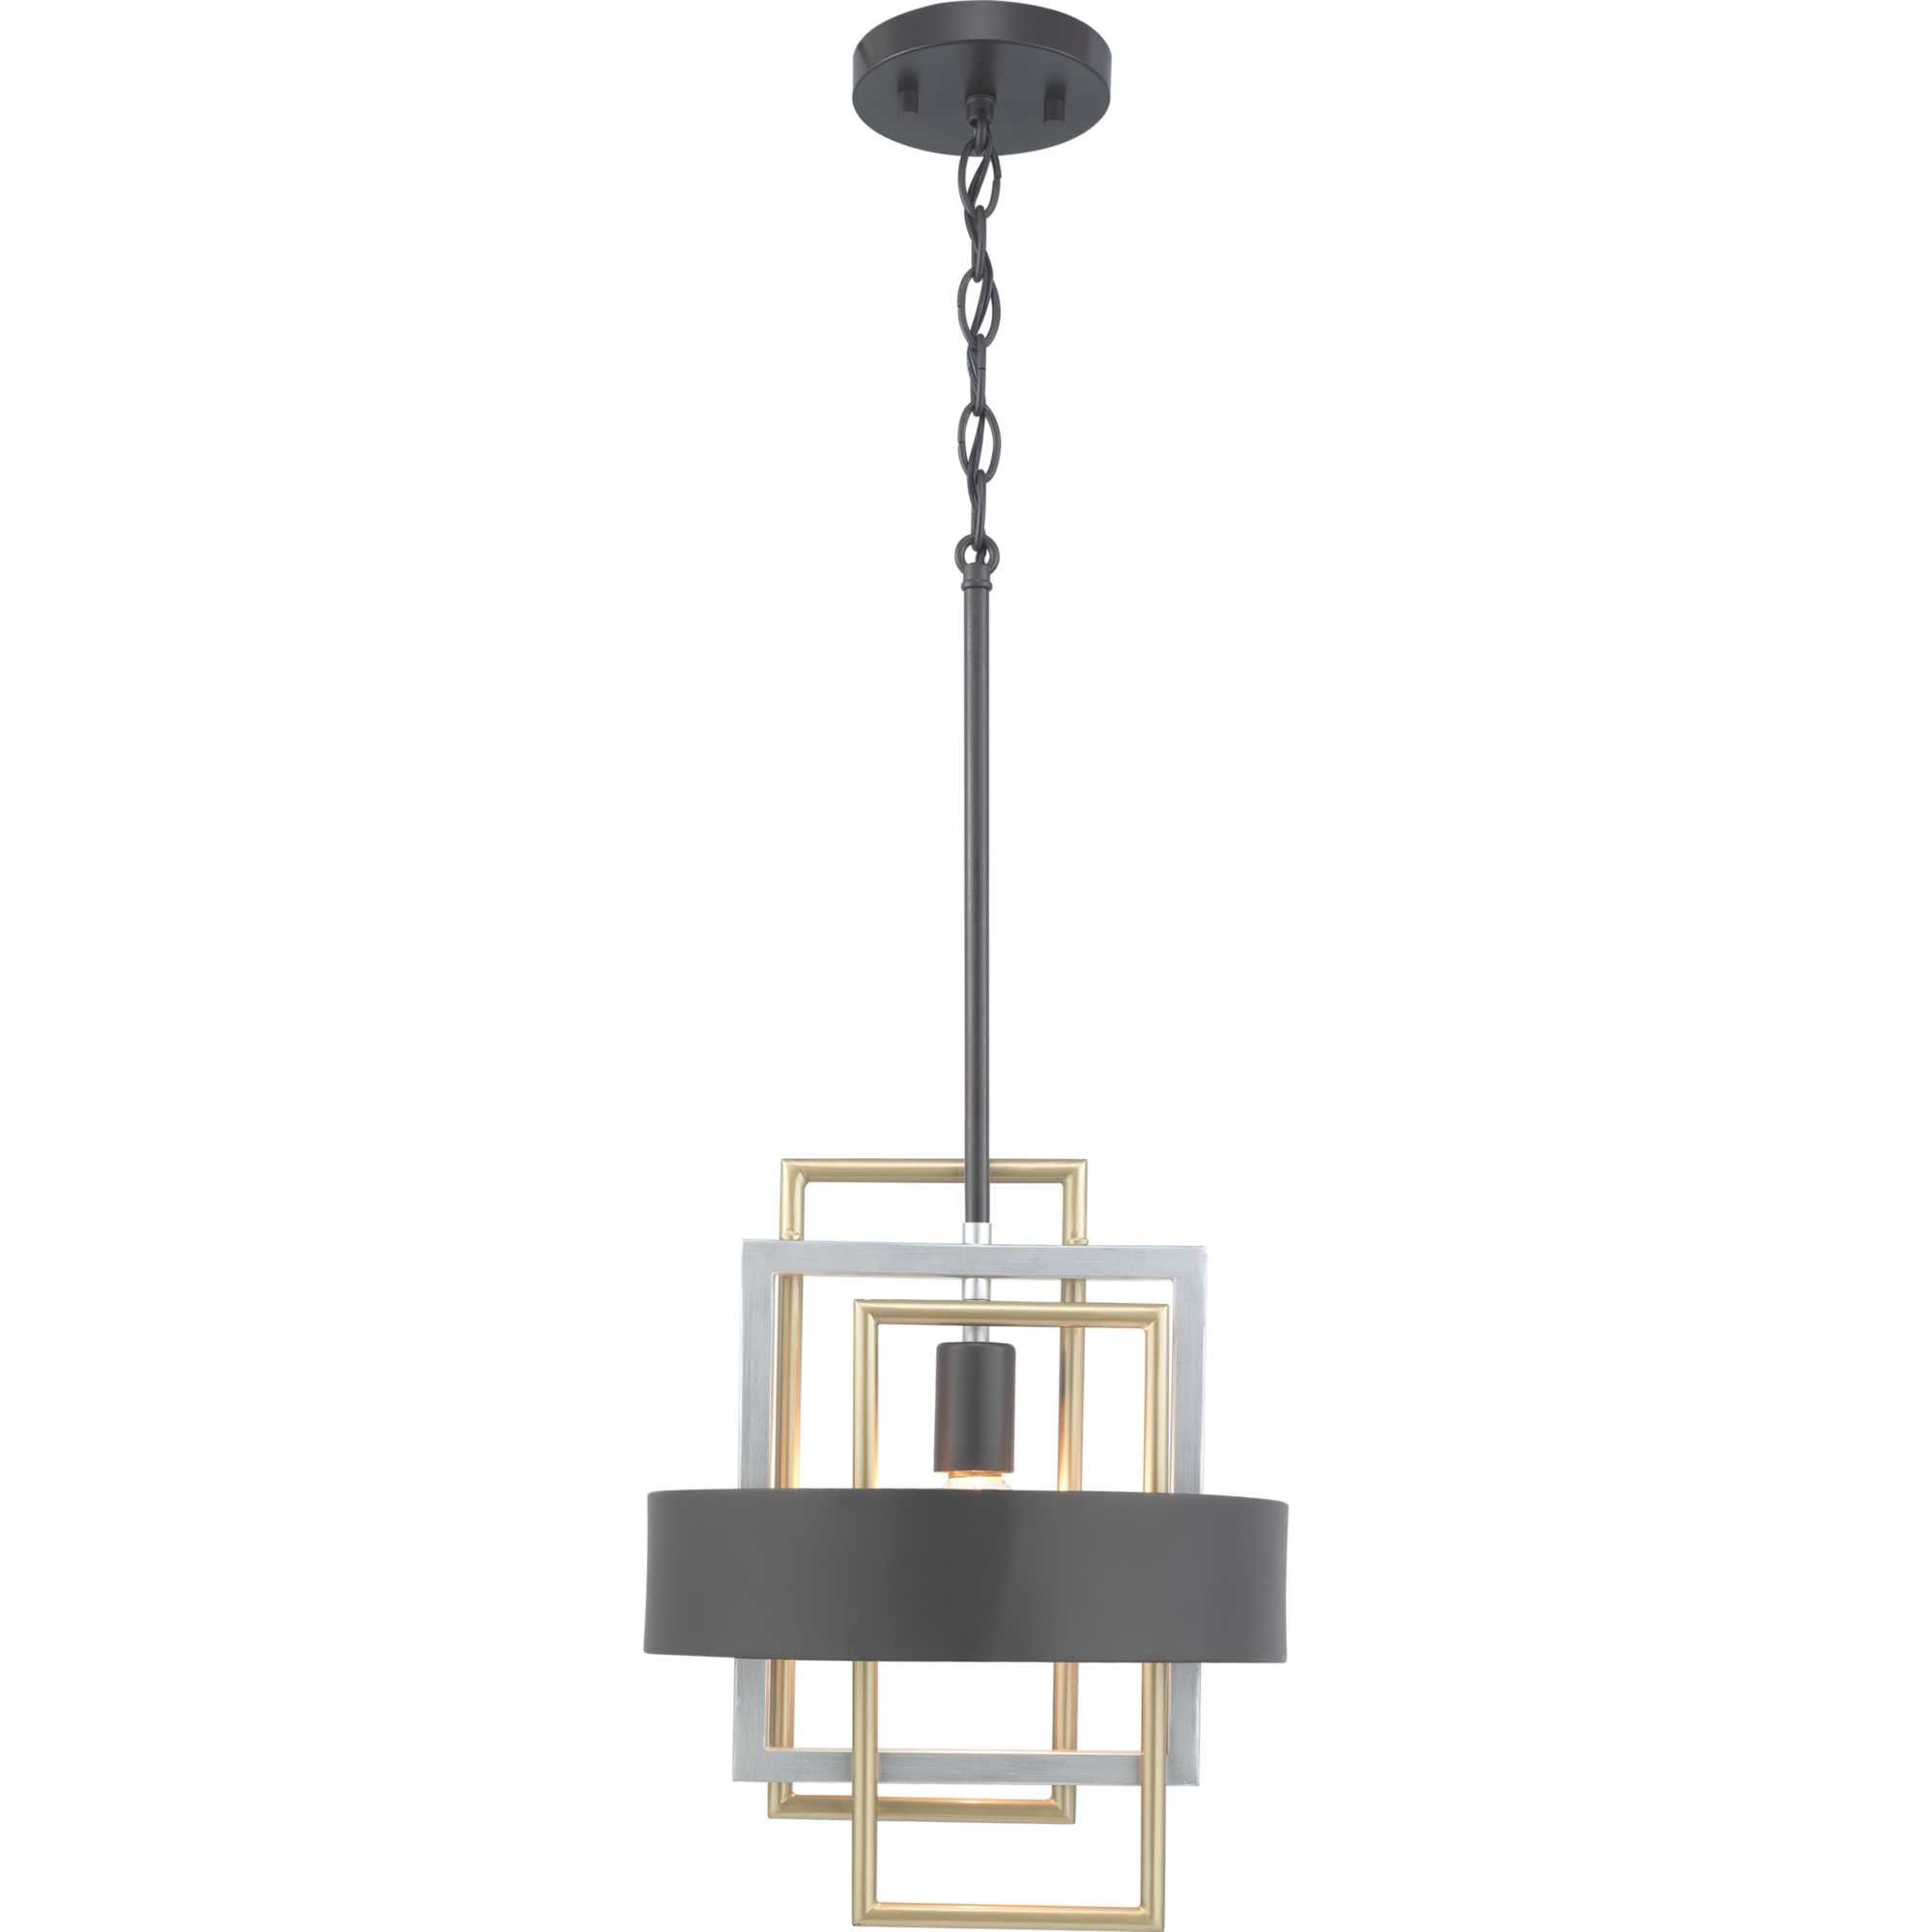 Best And Newest Callington 1 Light Led Single Geometric Pendants Pertaining To Coralie 1 Light Geometric Pendant (View 7 of 25)